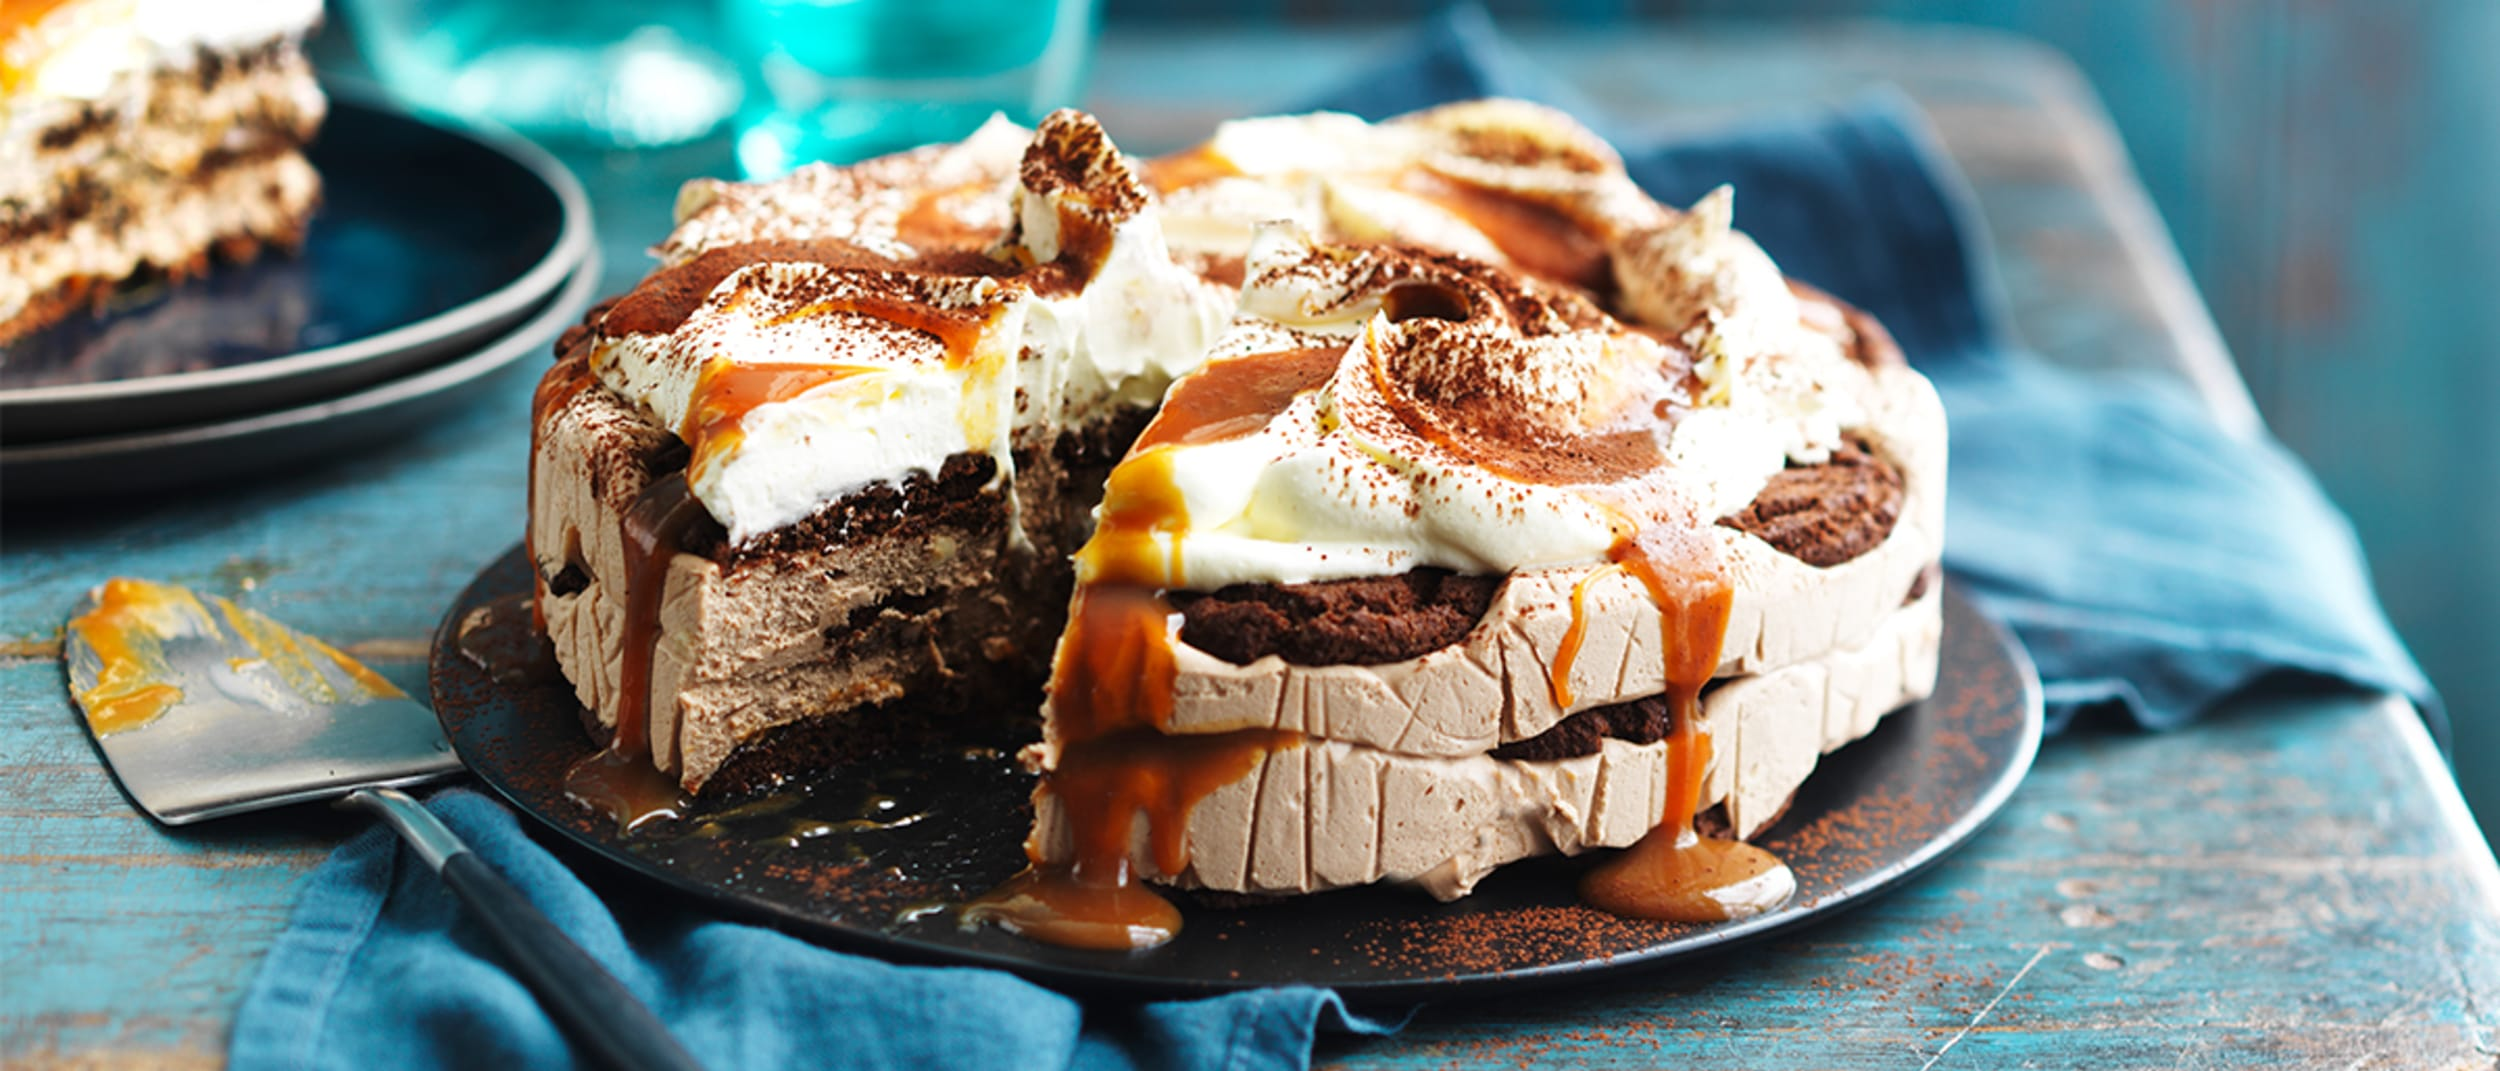 Chocolate ripple caramello cheesecake